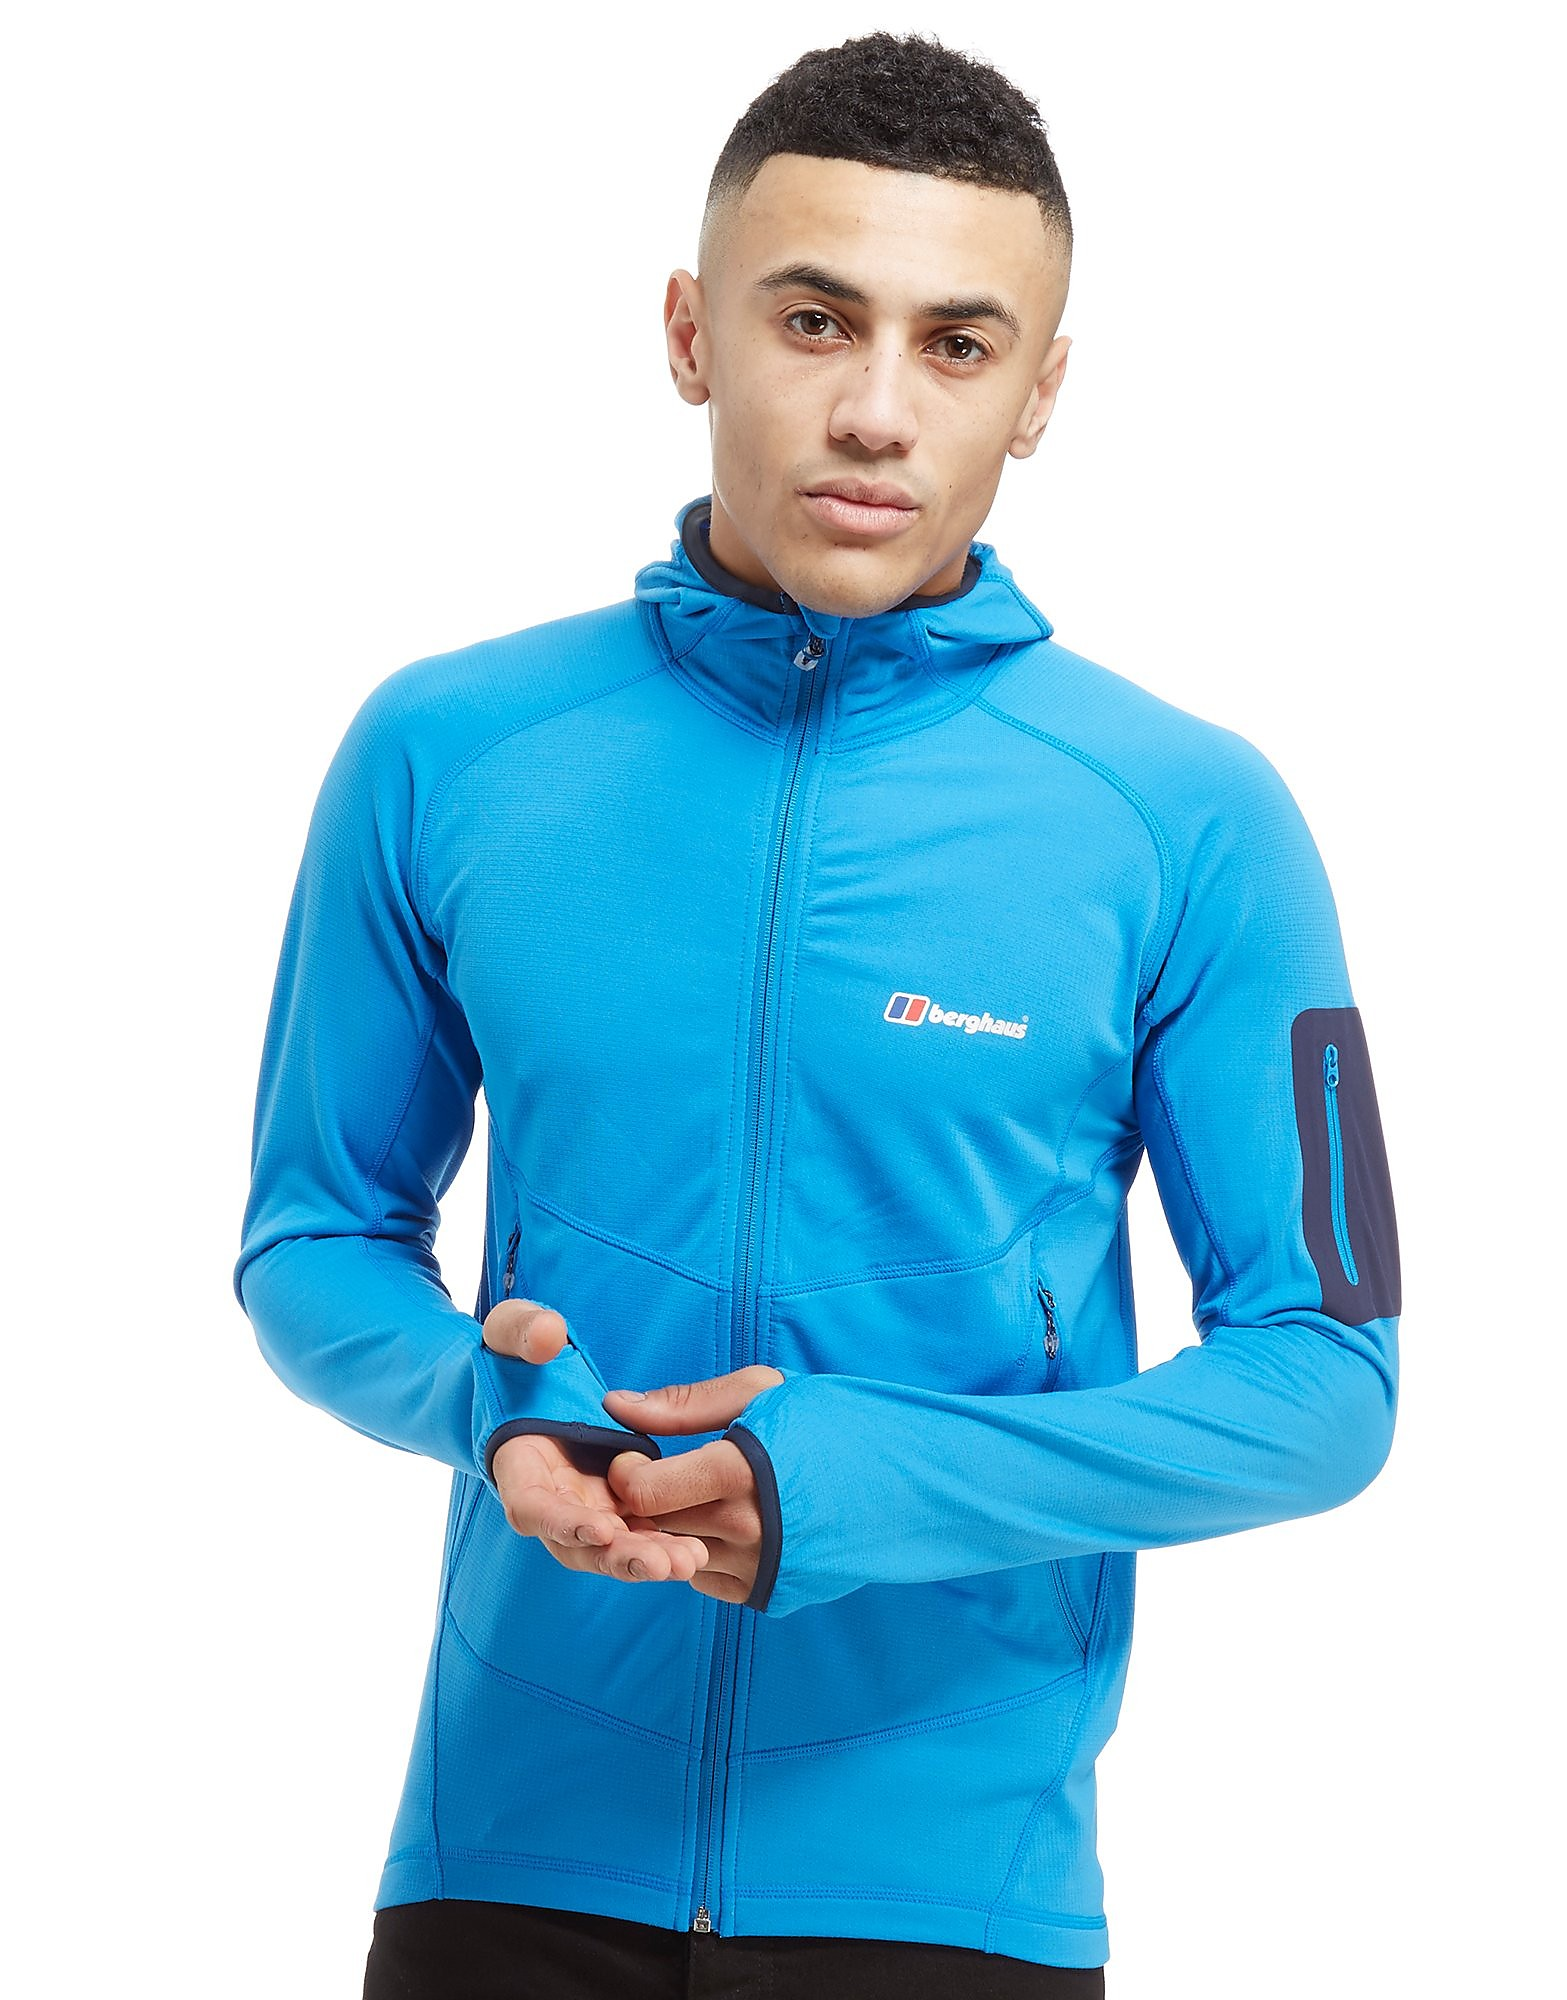 Berghaus Pravitale Lightweight Full Zip Jacket